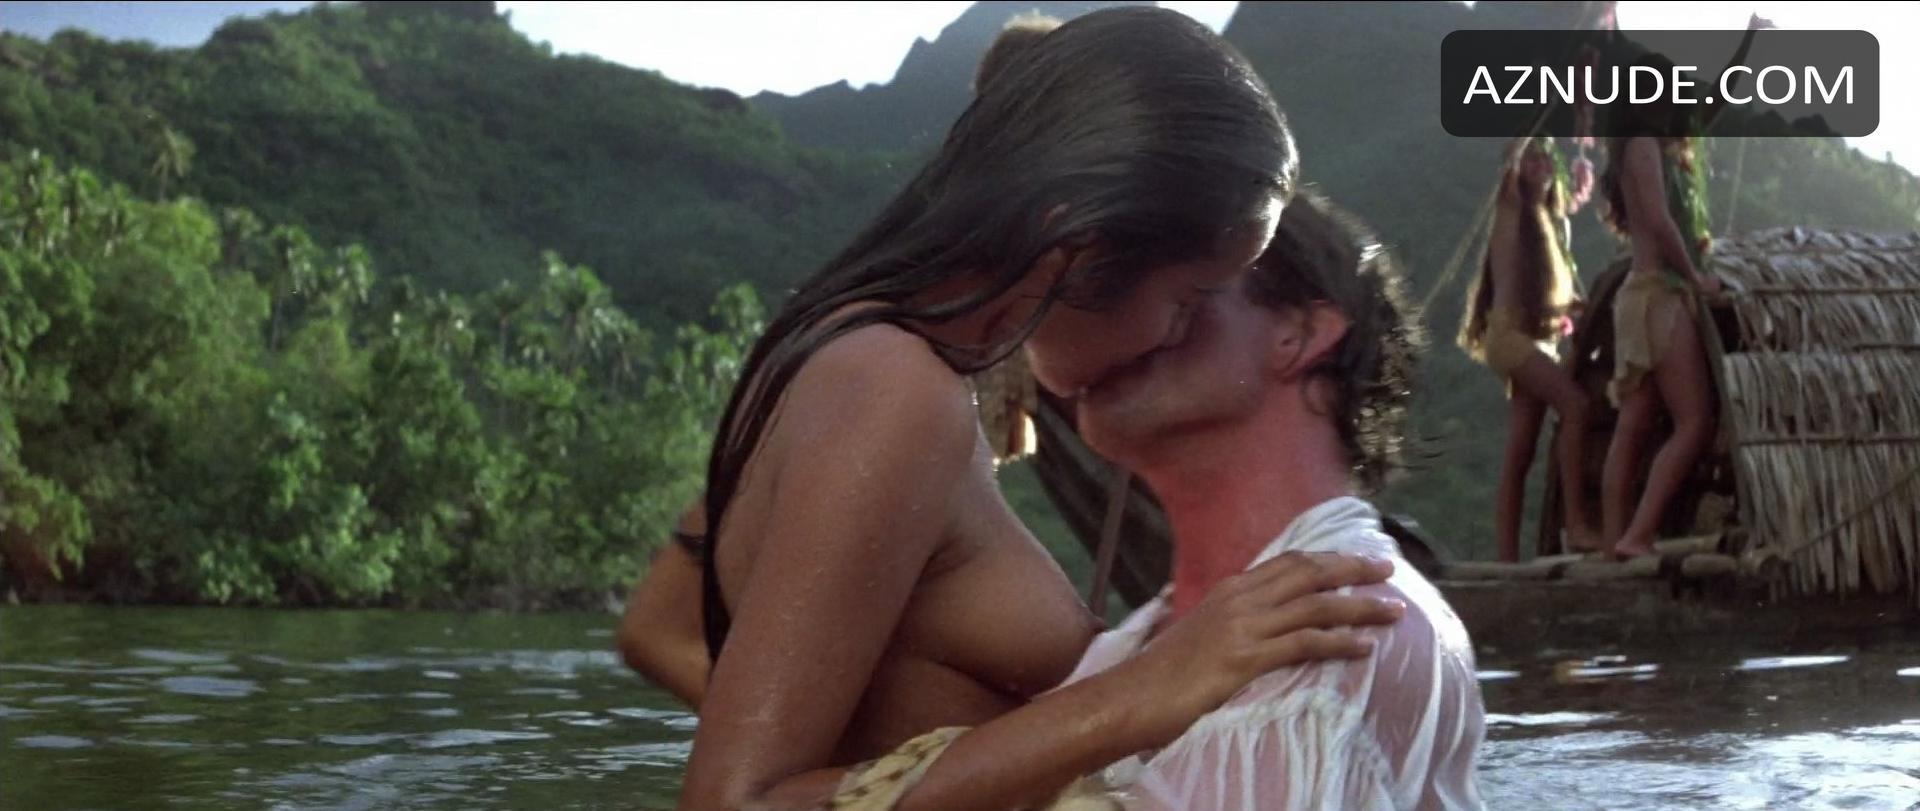 Nude Women Porn Movies